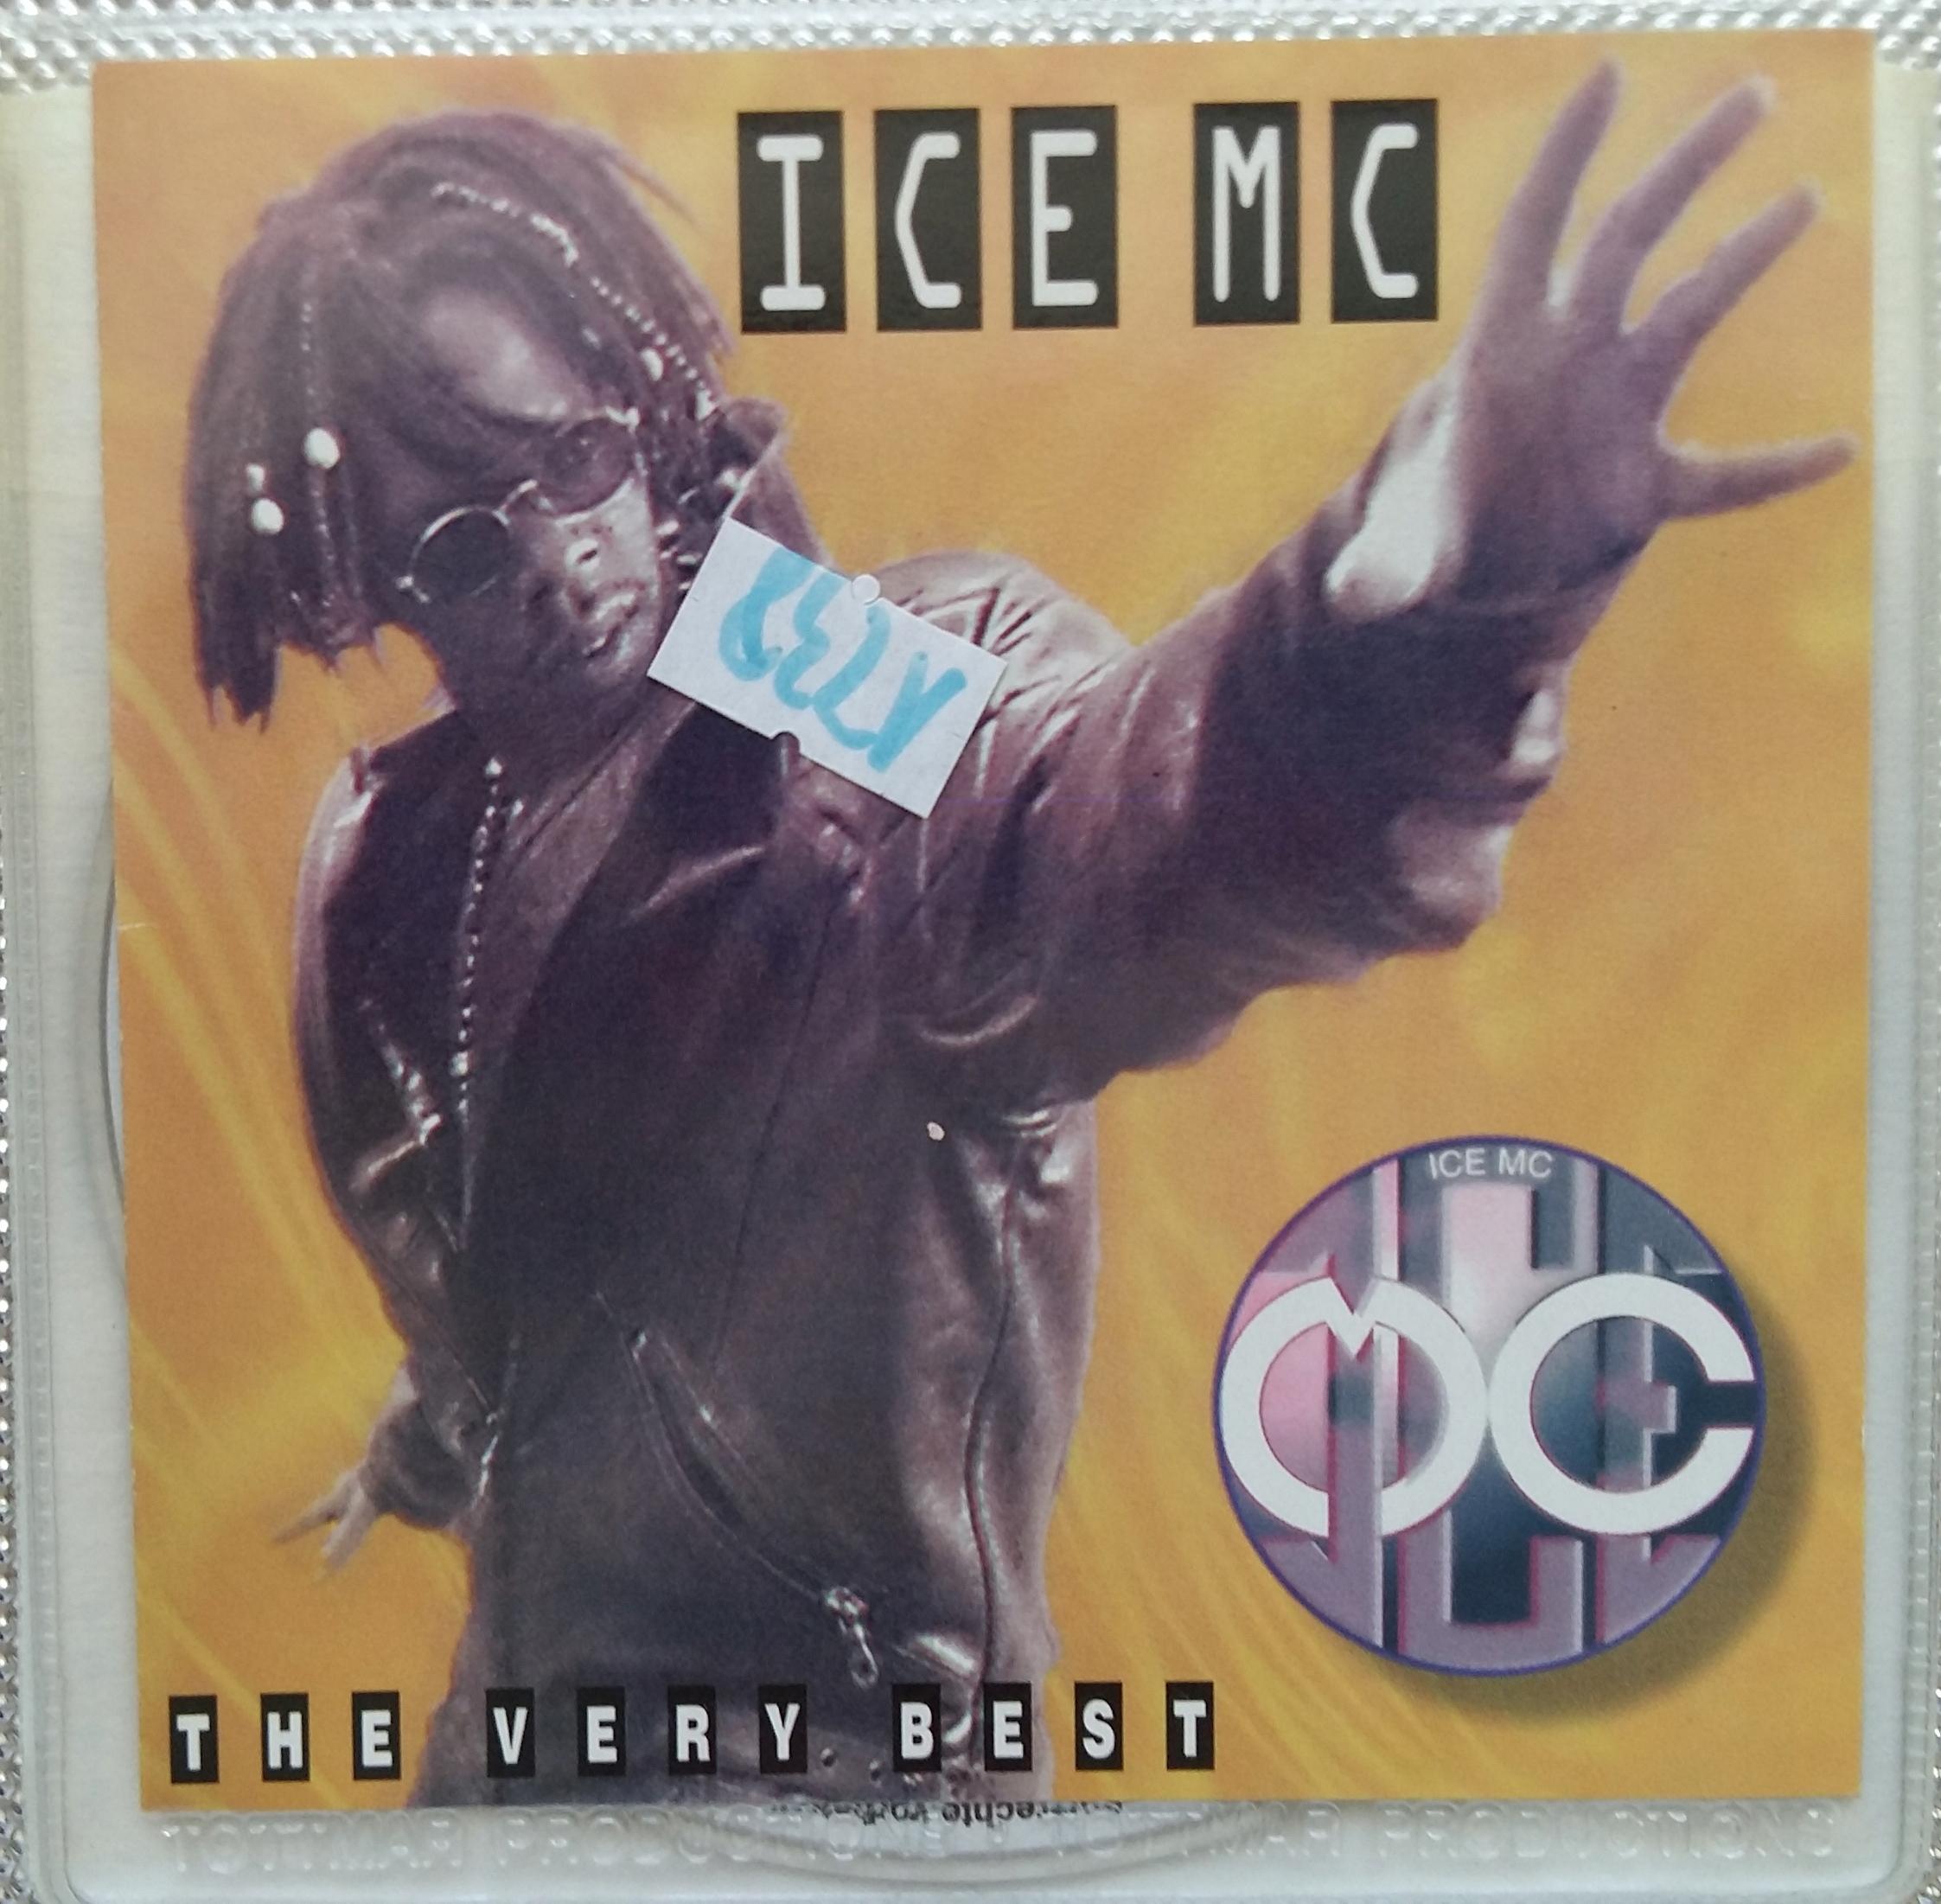 ICE MC - the very best